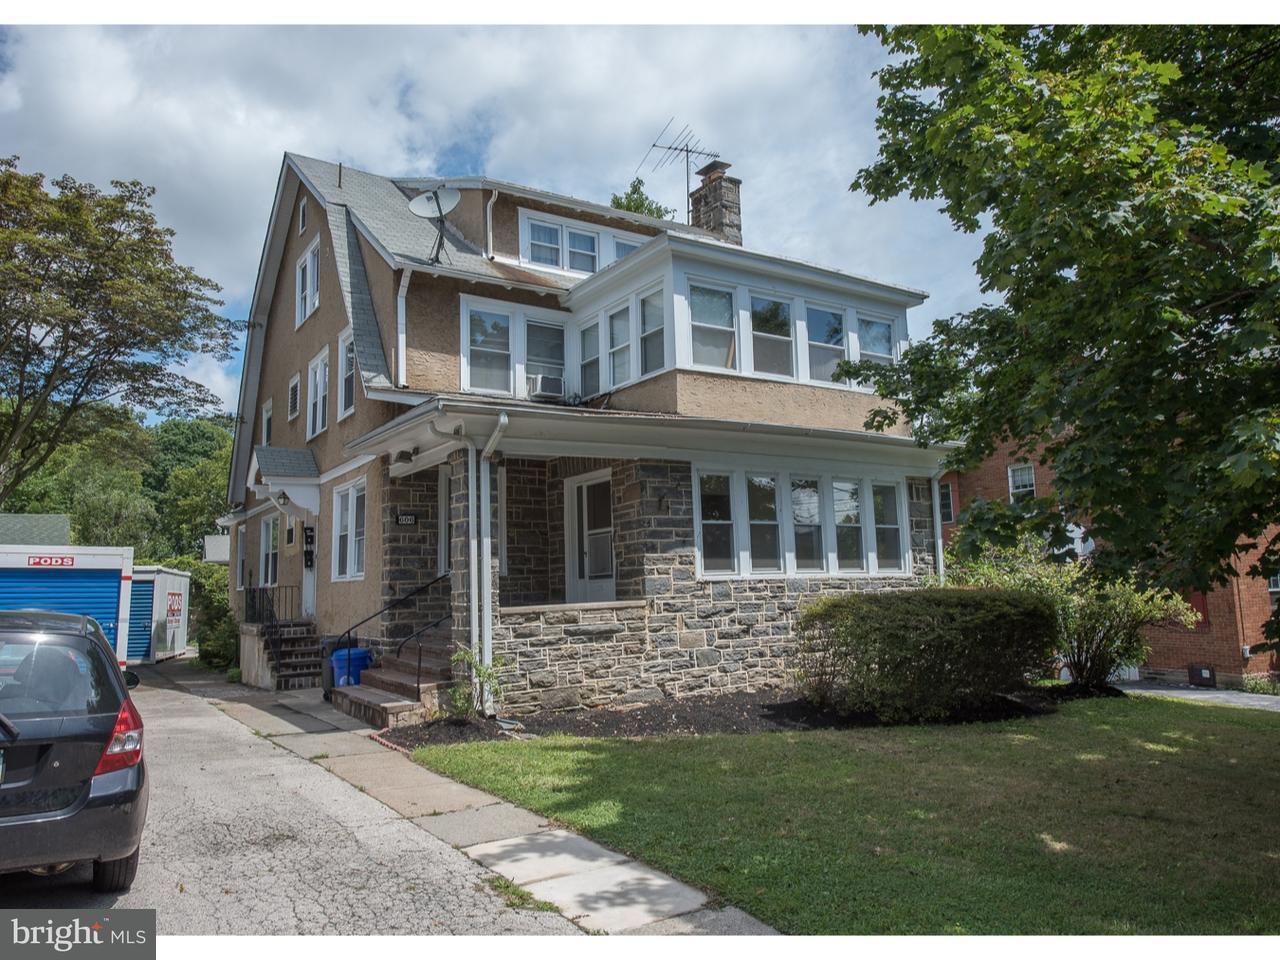 606 Penfield Avenue Havertown, PA 19083